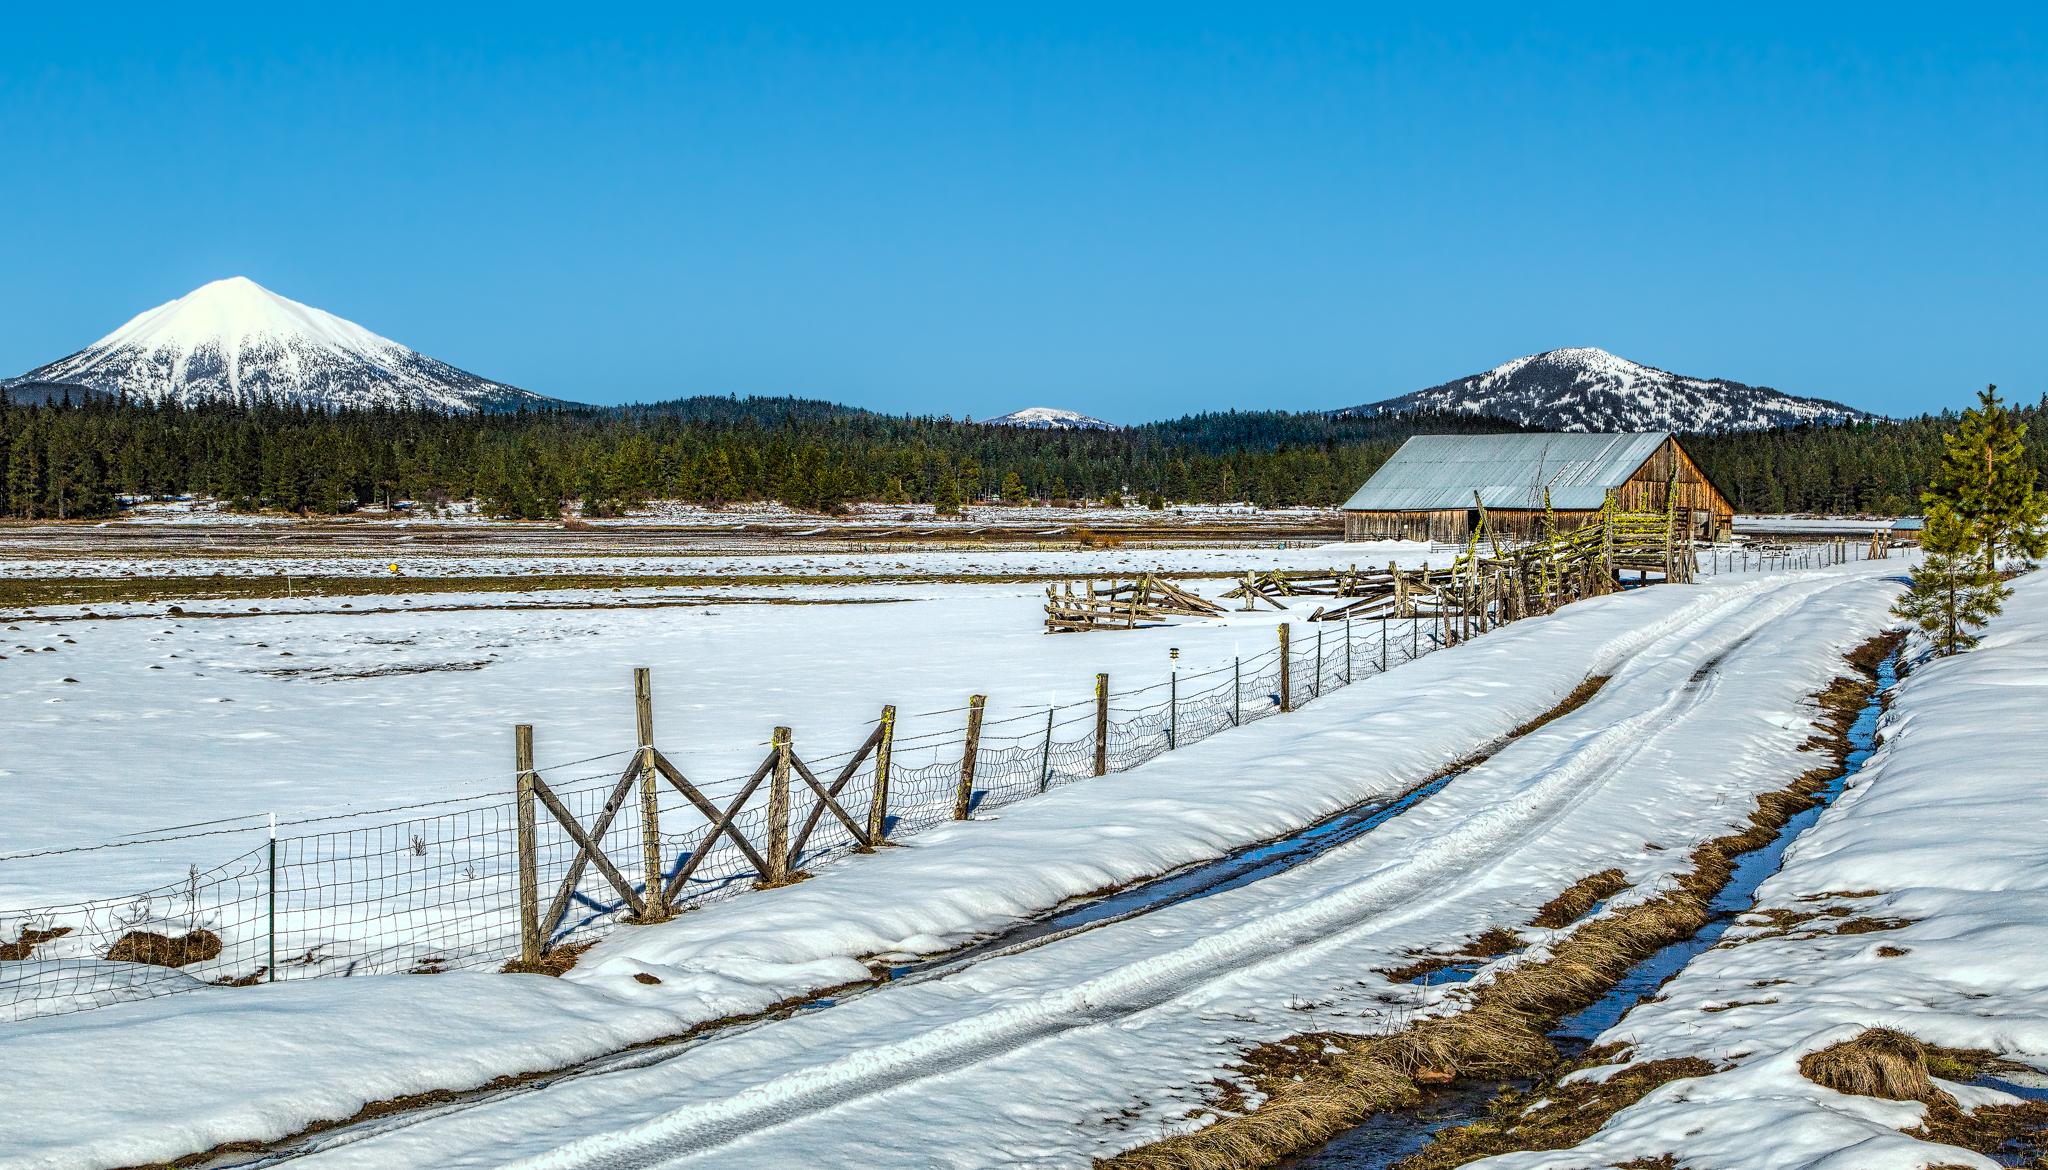 farmer u0026 39 s almanac predicts mild winter 2017